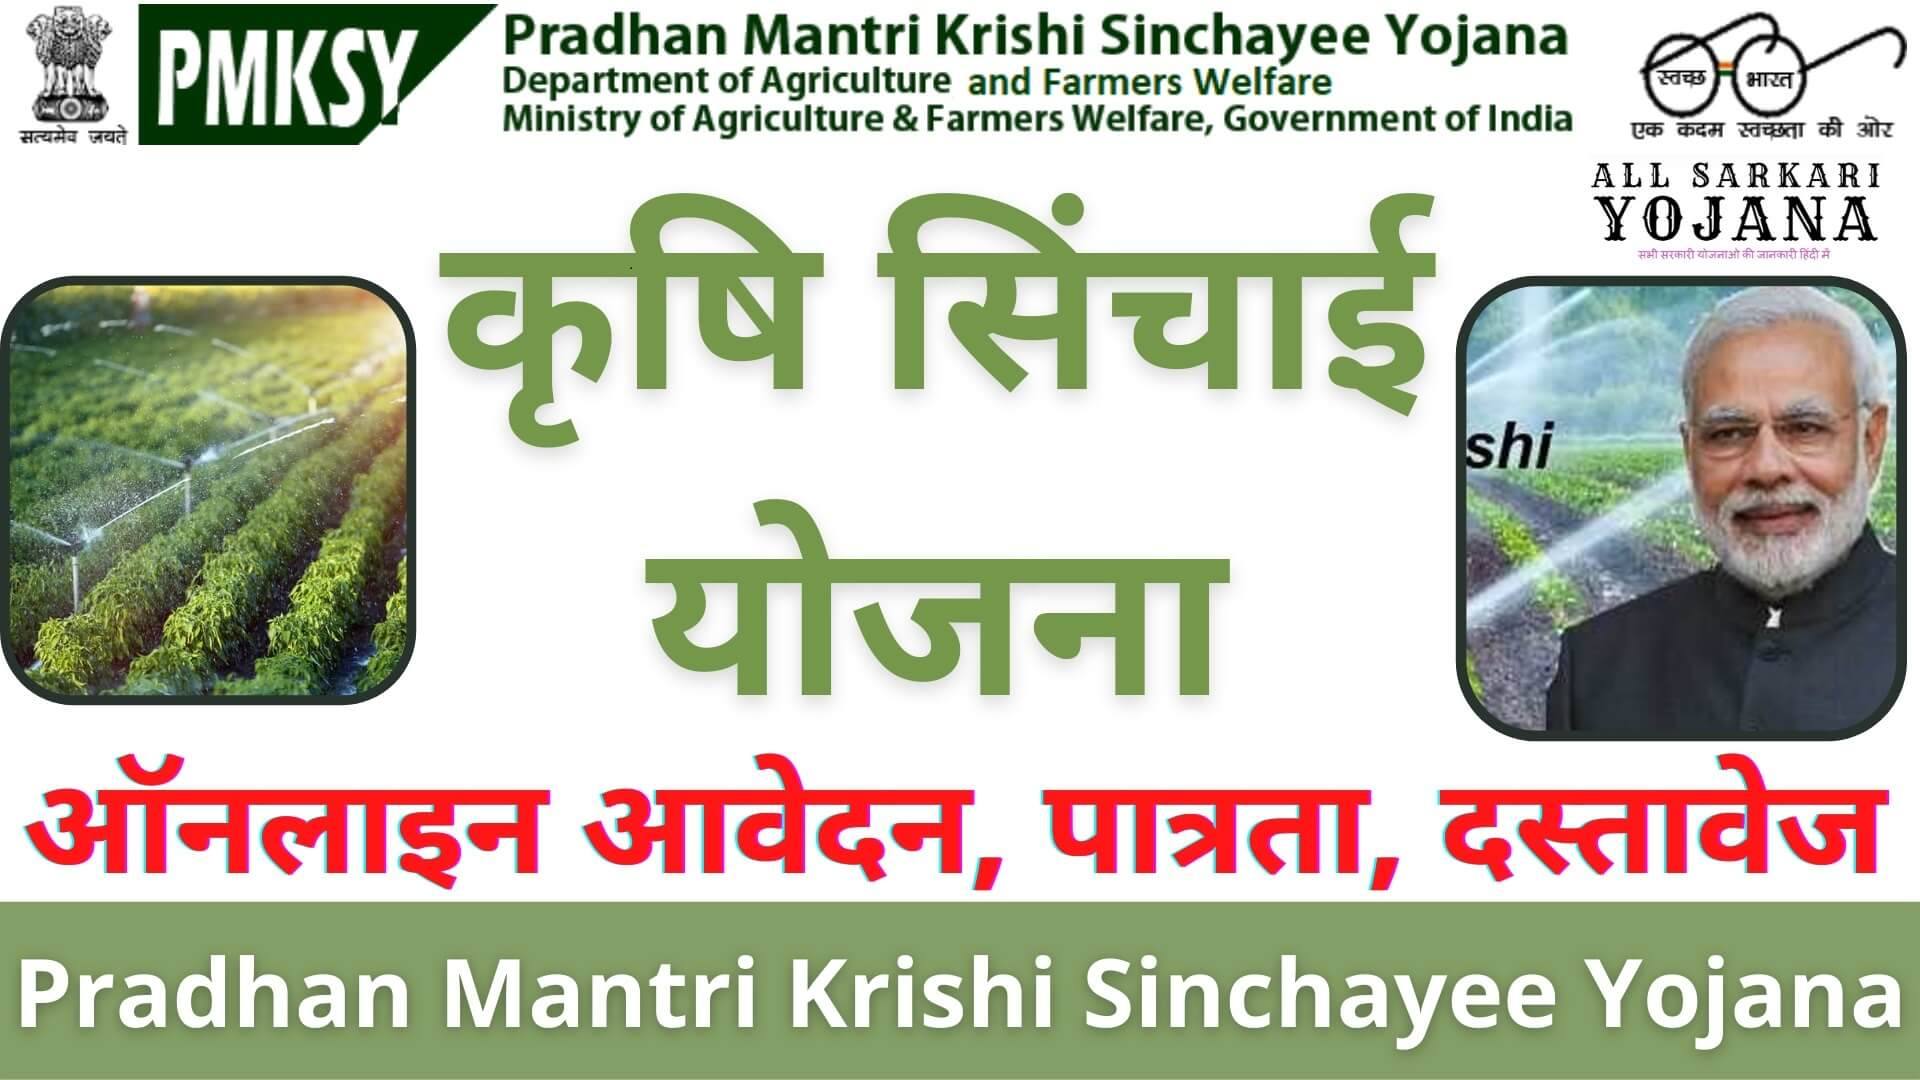 Pradhan Mantri Krishi Sinchayee Yojana